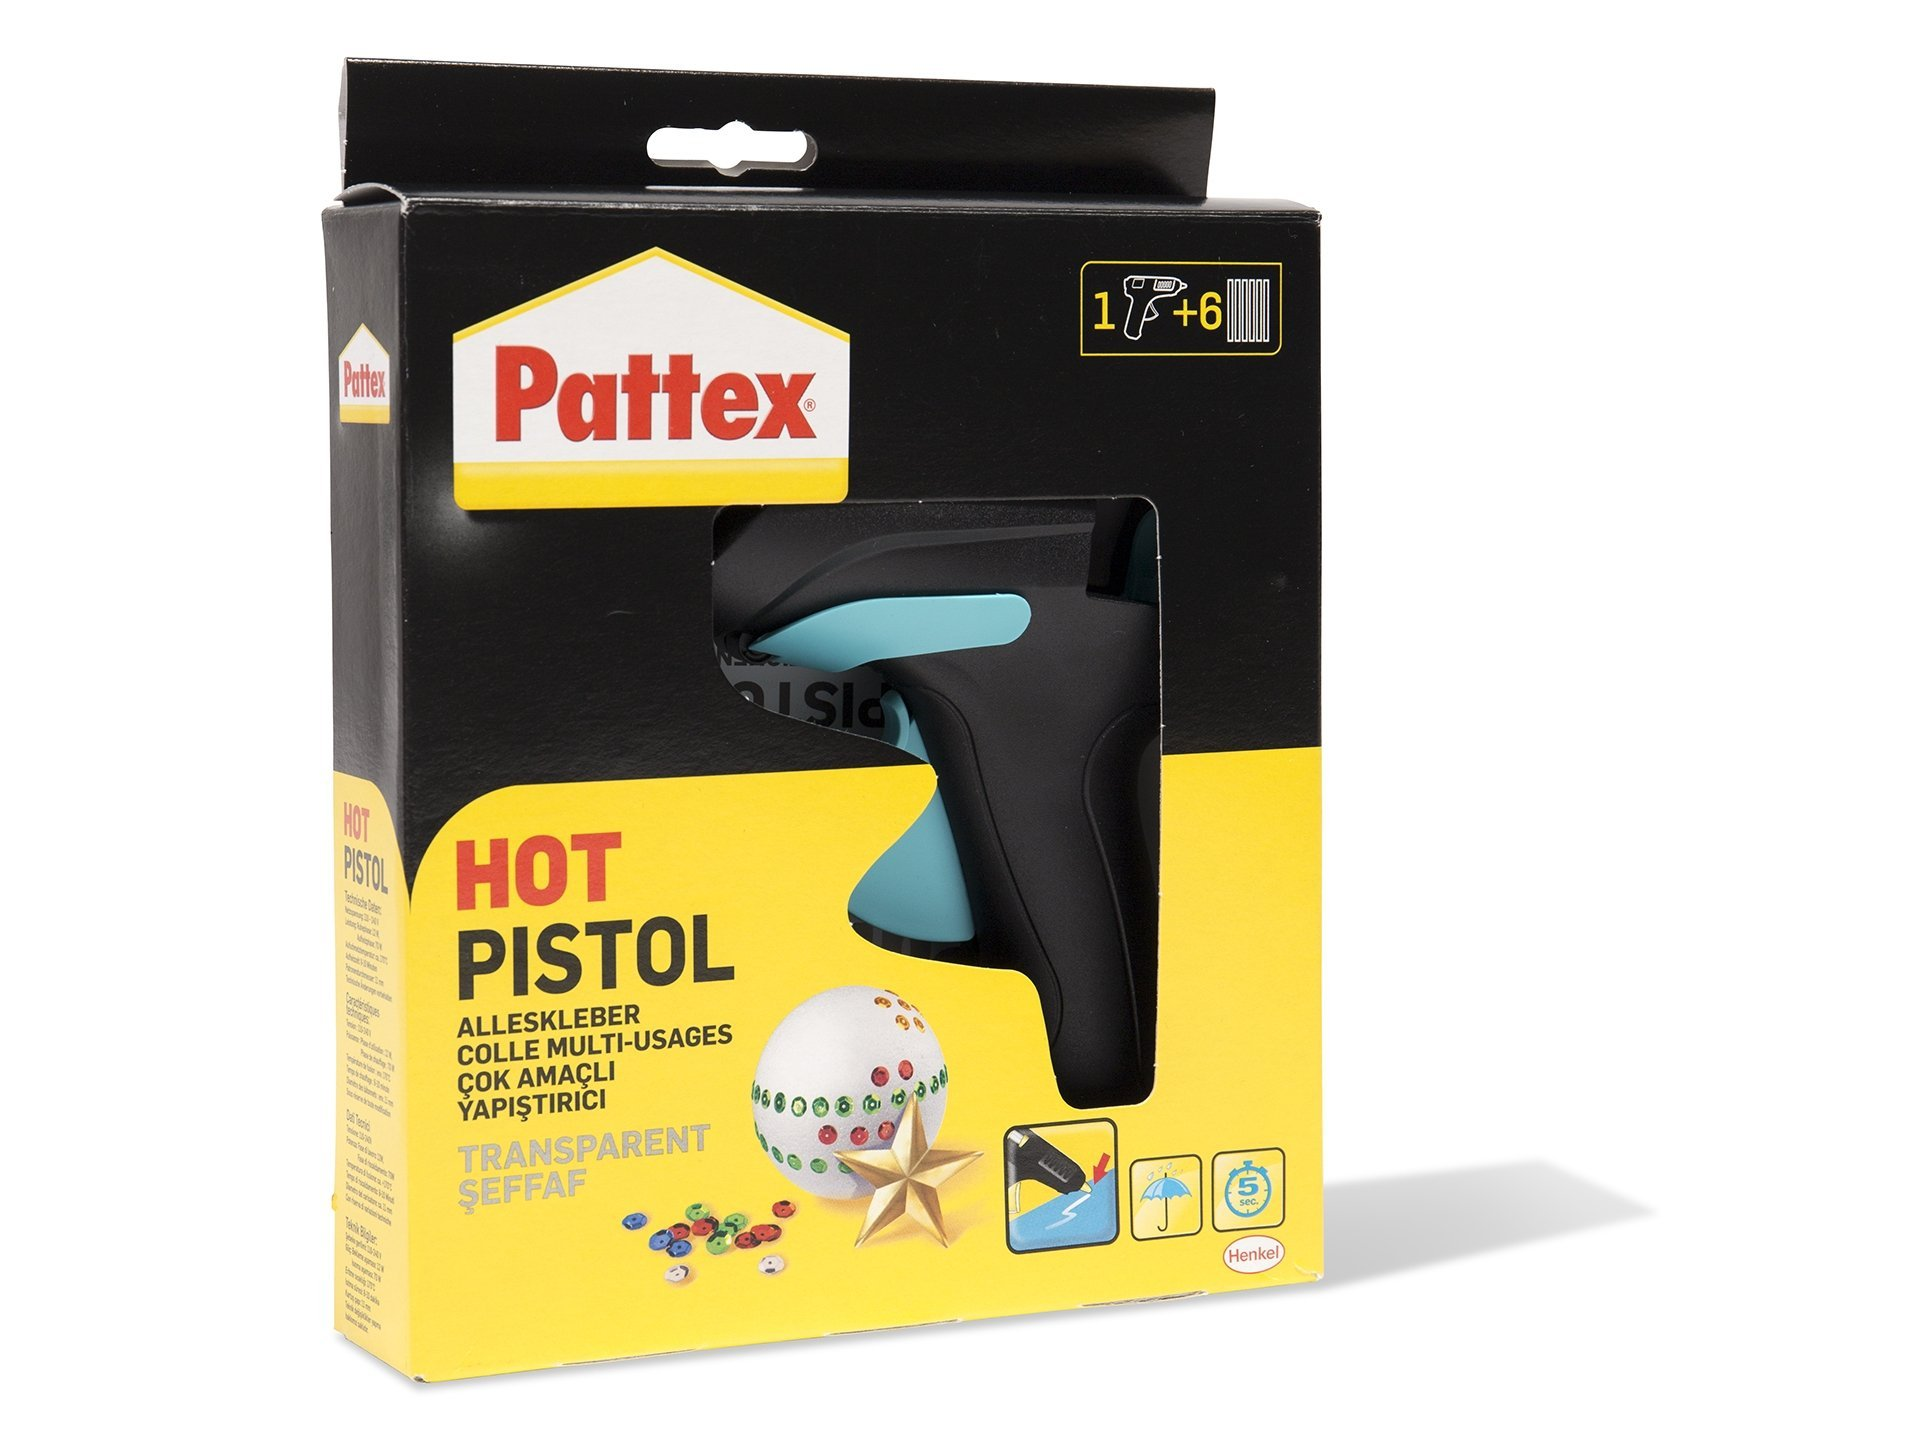 pattex hobby hot pistol hei klebepistole kaufen modulor. Black Bedroom Furniture Sets. Home Design Ideas